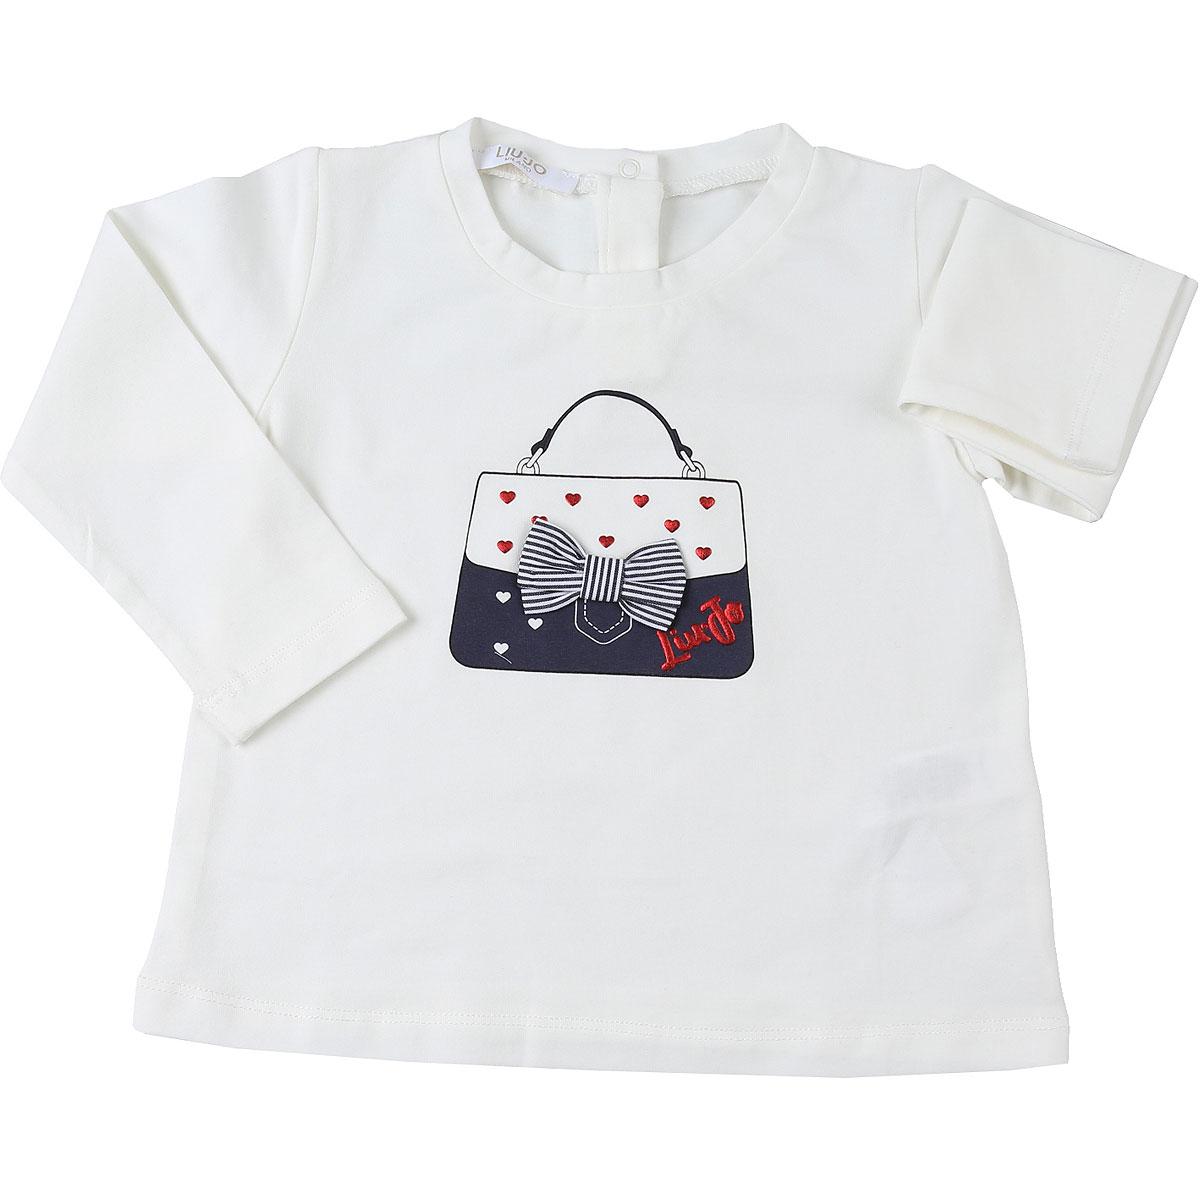 Liu Jo Baby T-Shirt for Girls On Sale, White Snow, Cotton, 2019, 12M 6M 9M